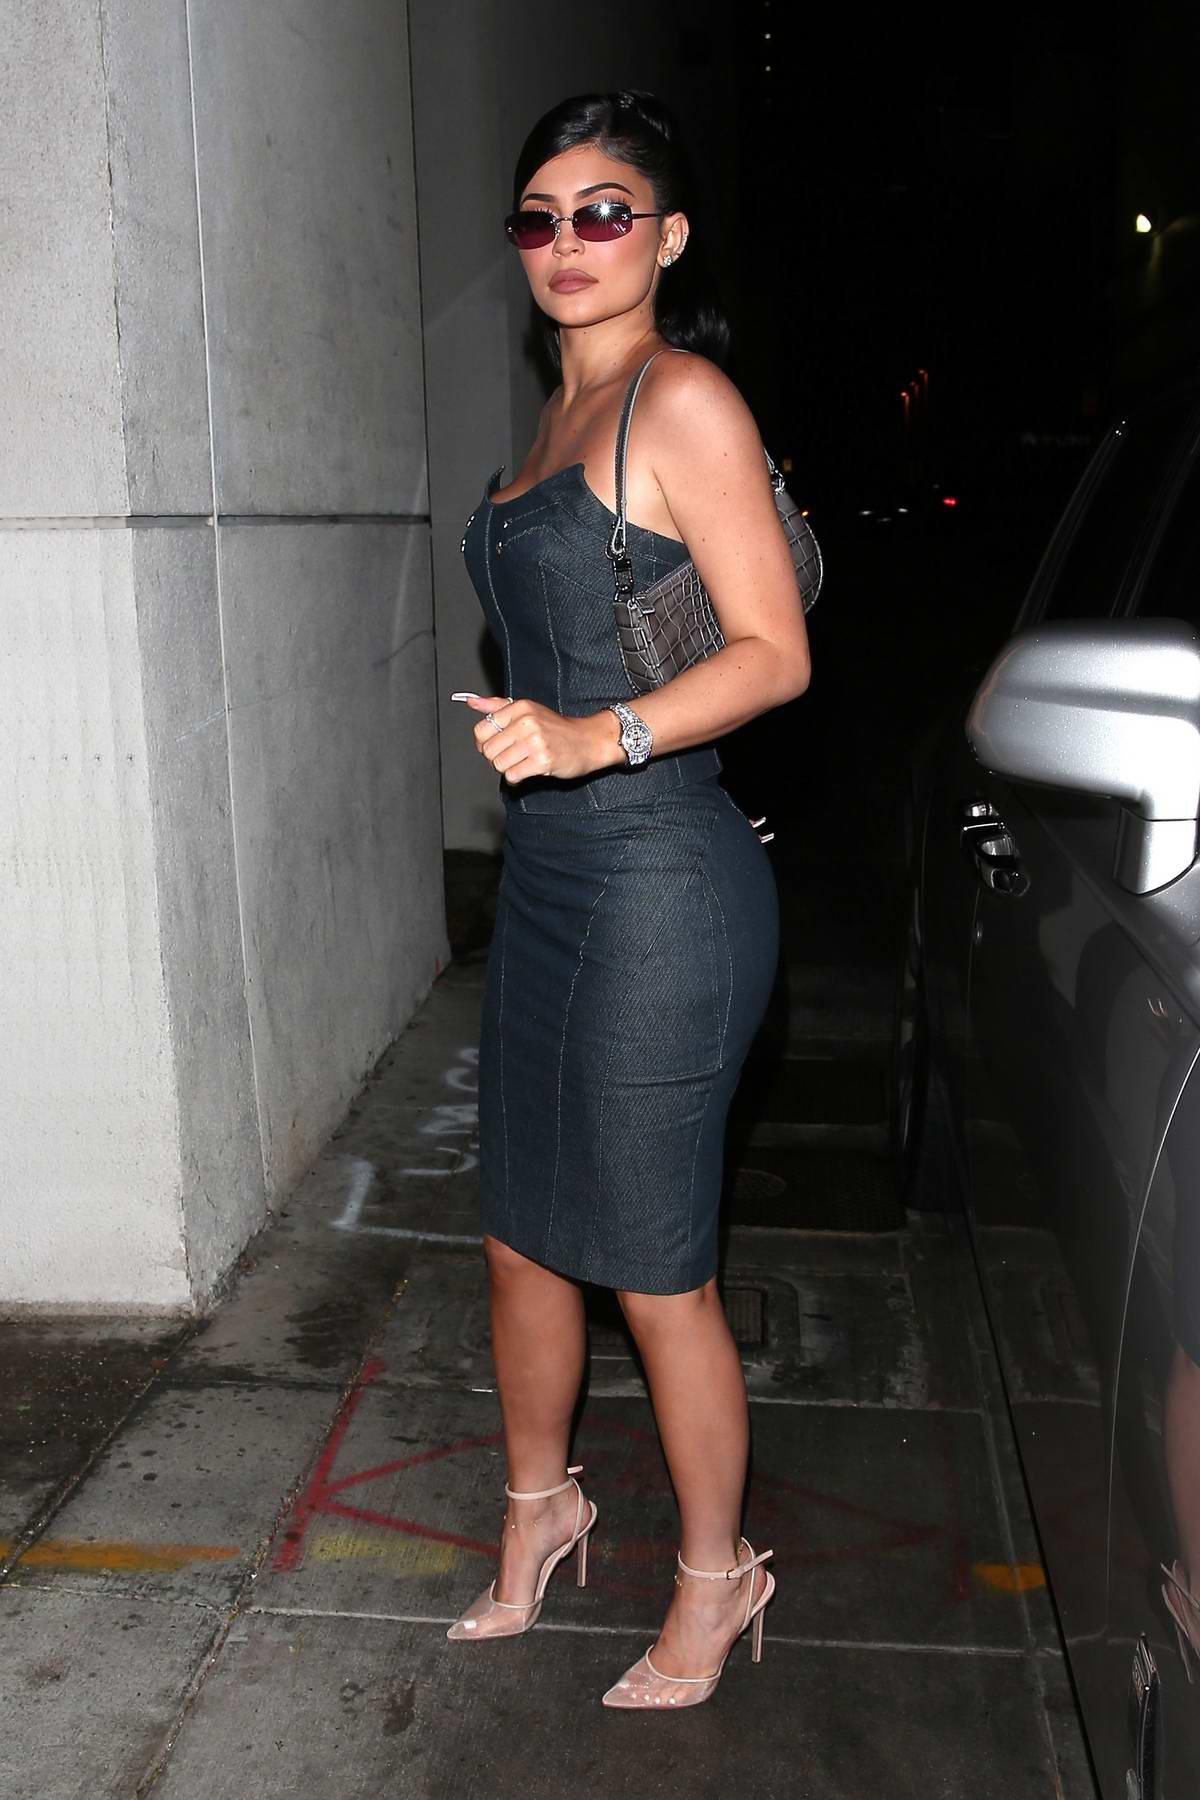 Kylie Jenner arrives to the after party of boyfriend Travis Scott's Netflix TV docu-series in Santa Monica, California